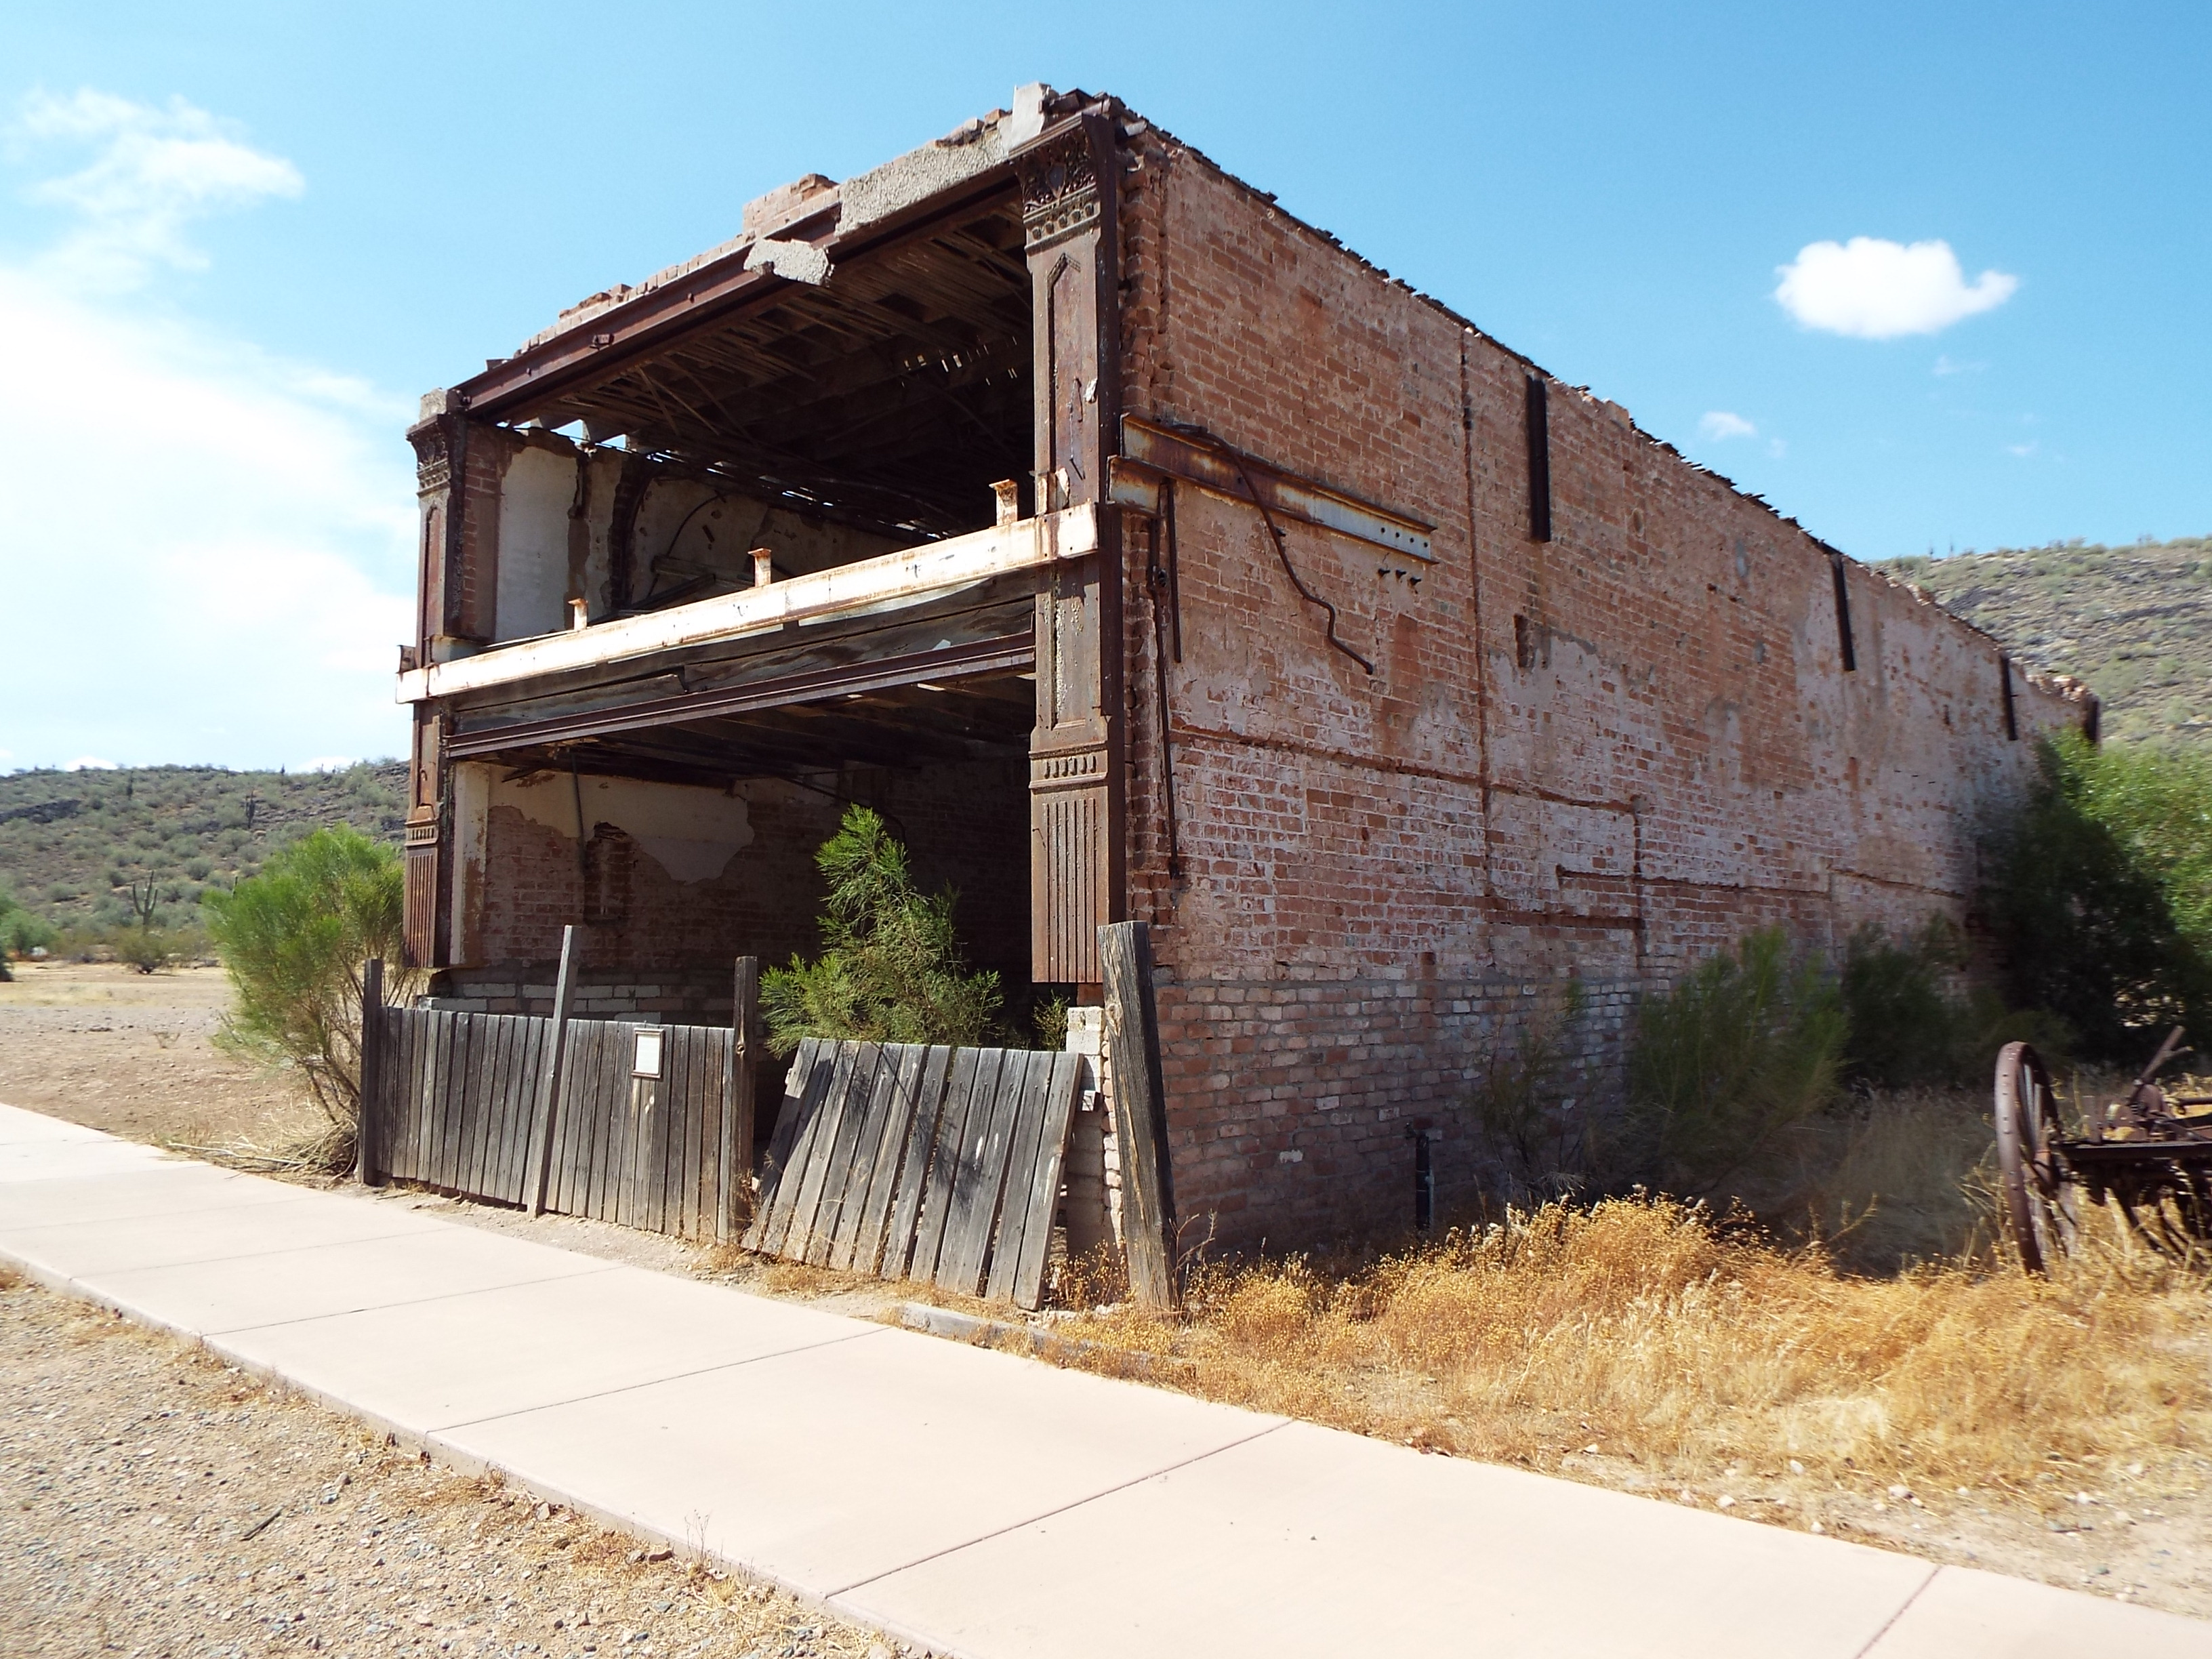 File:Phoenix-Pioneer Living History Museum-Phoenix Bakery